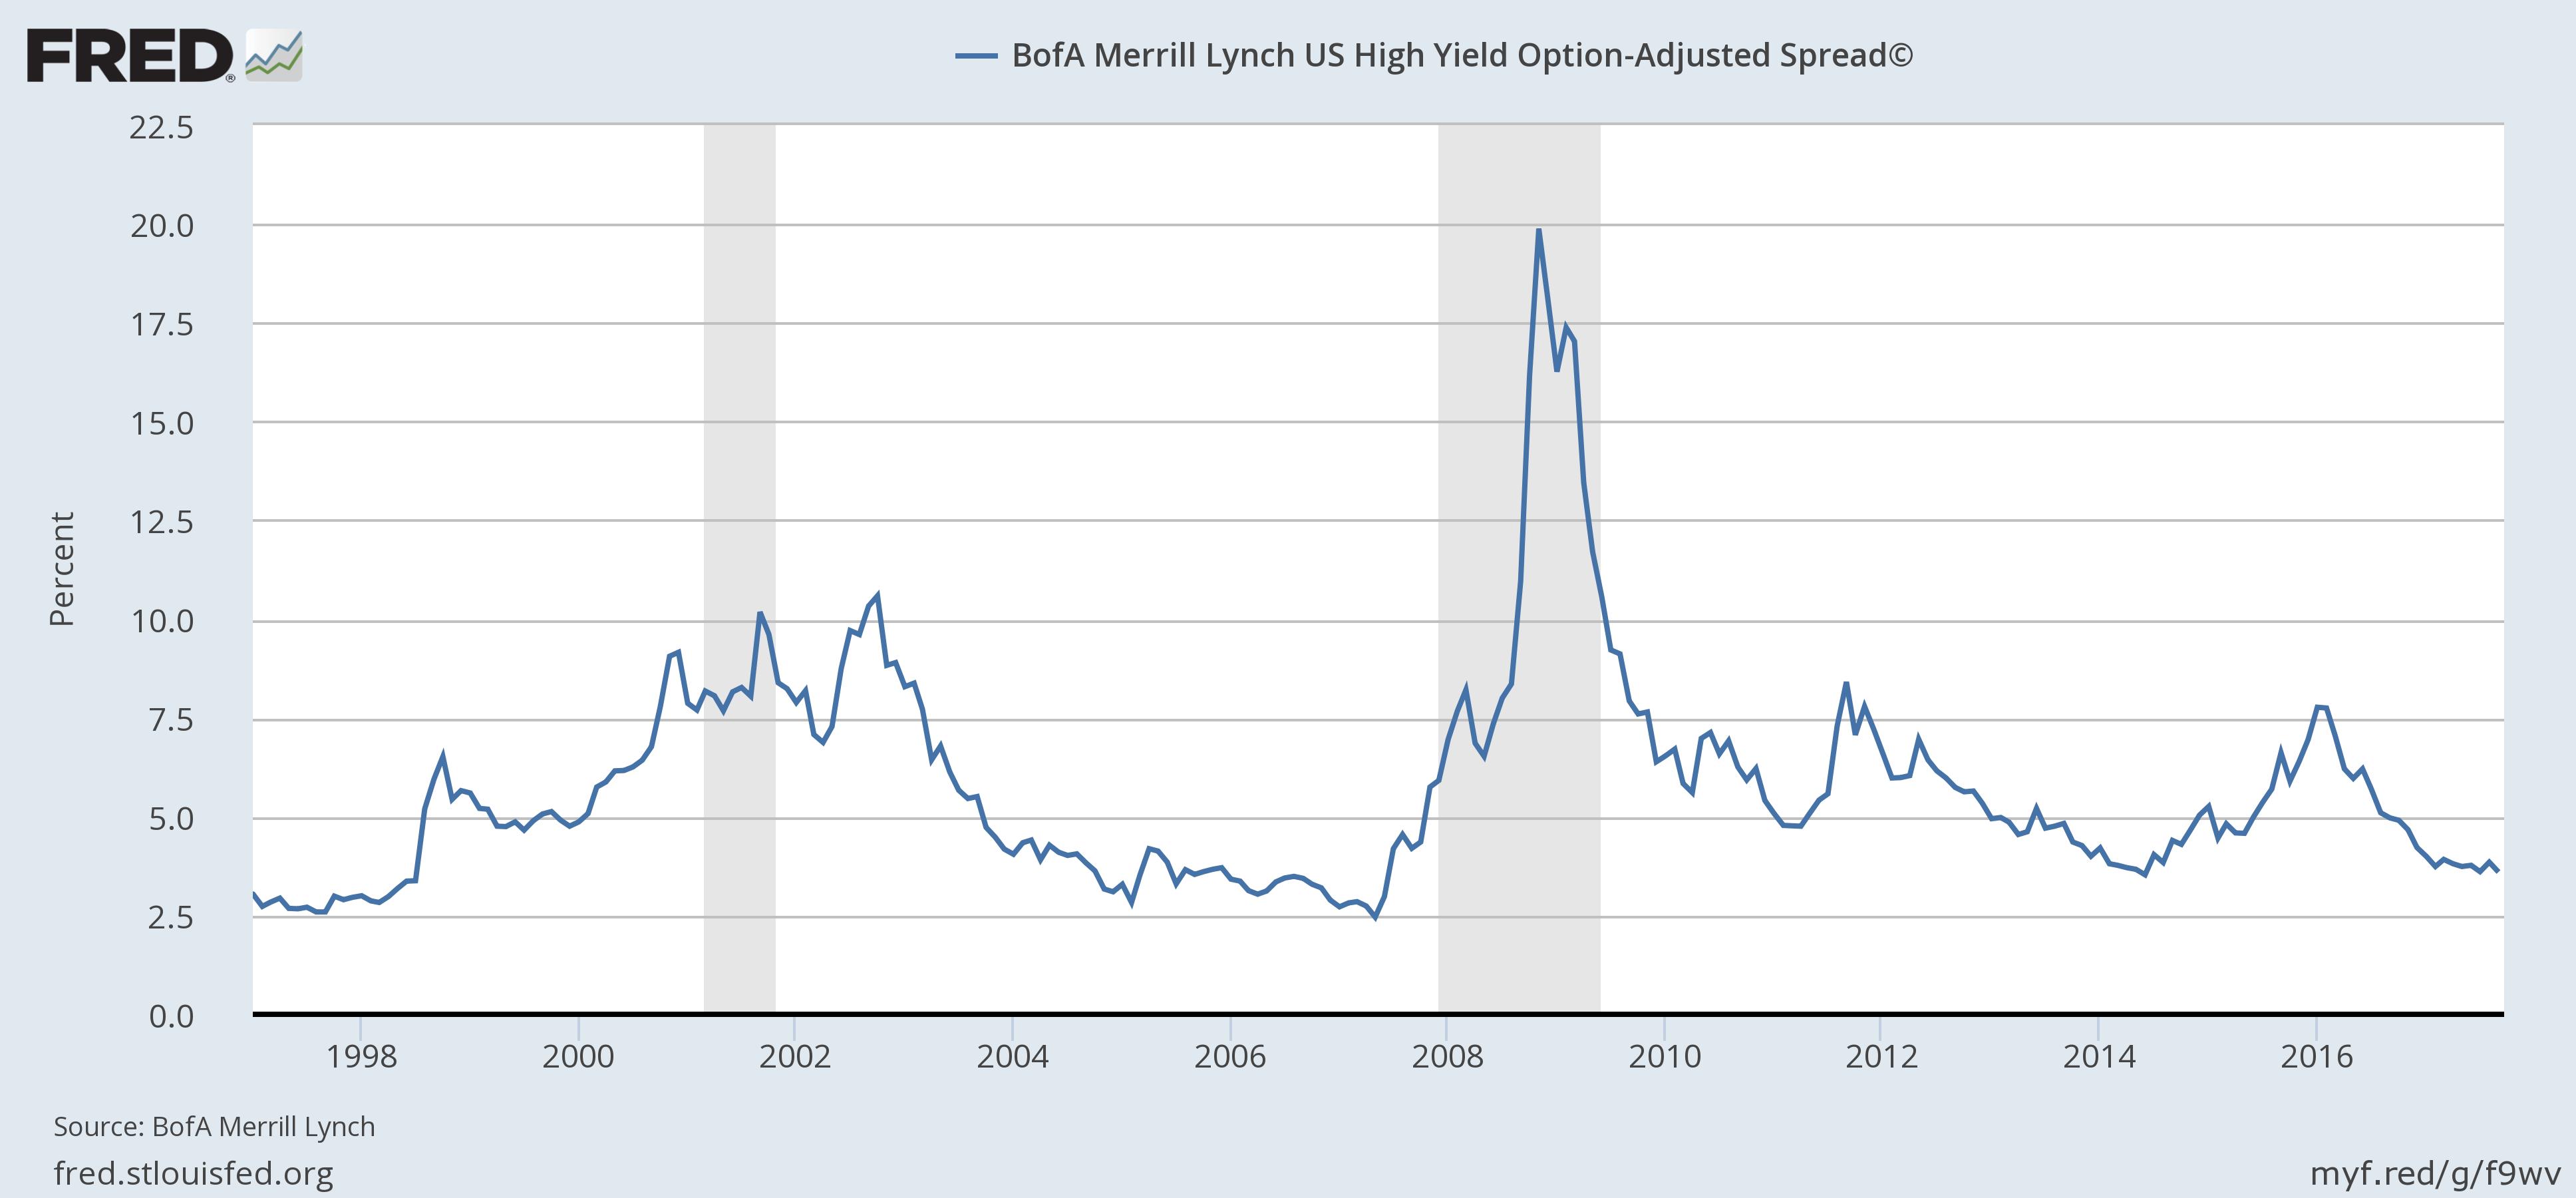 BofA Merrill Lynch US High Yield, 1998 - 2016